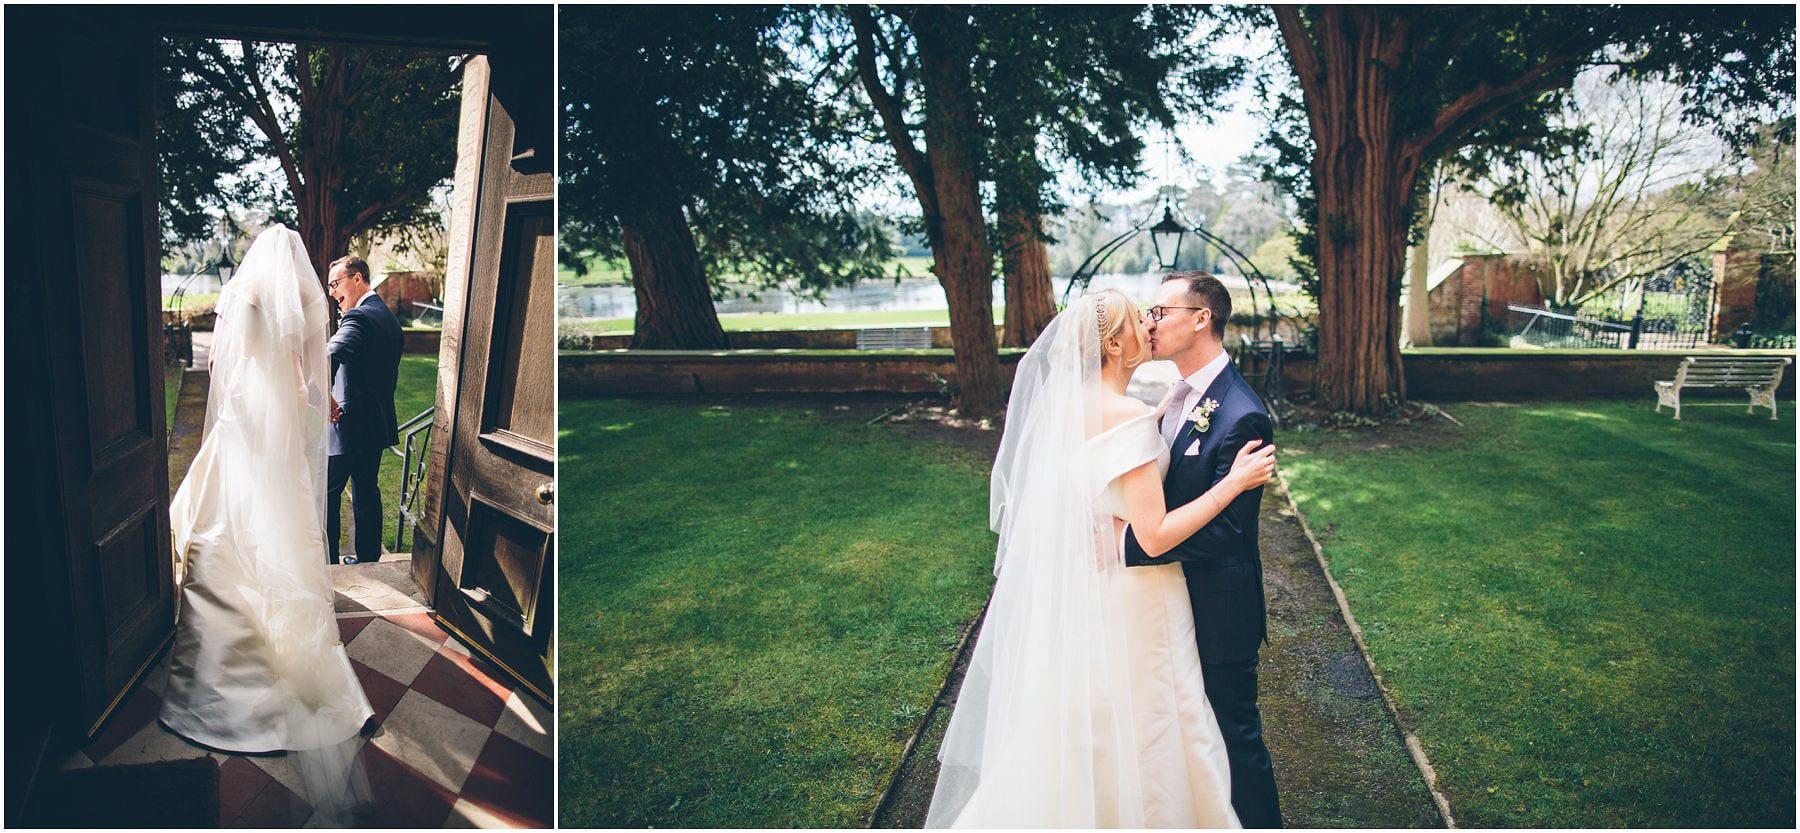 Capesthorne_Hall_Wedding_Photography_0067